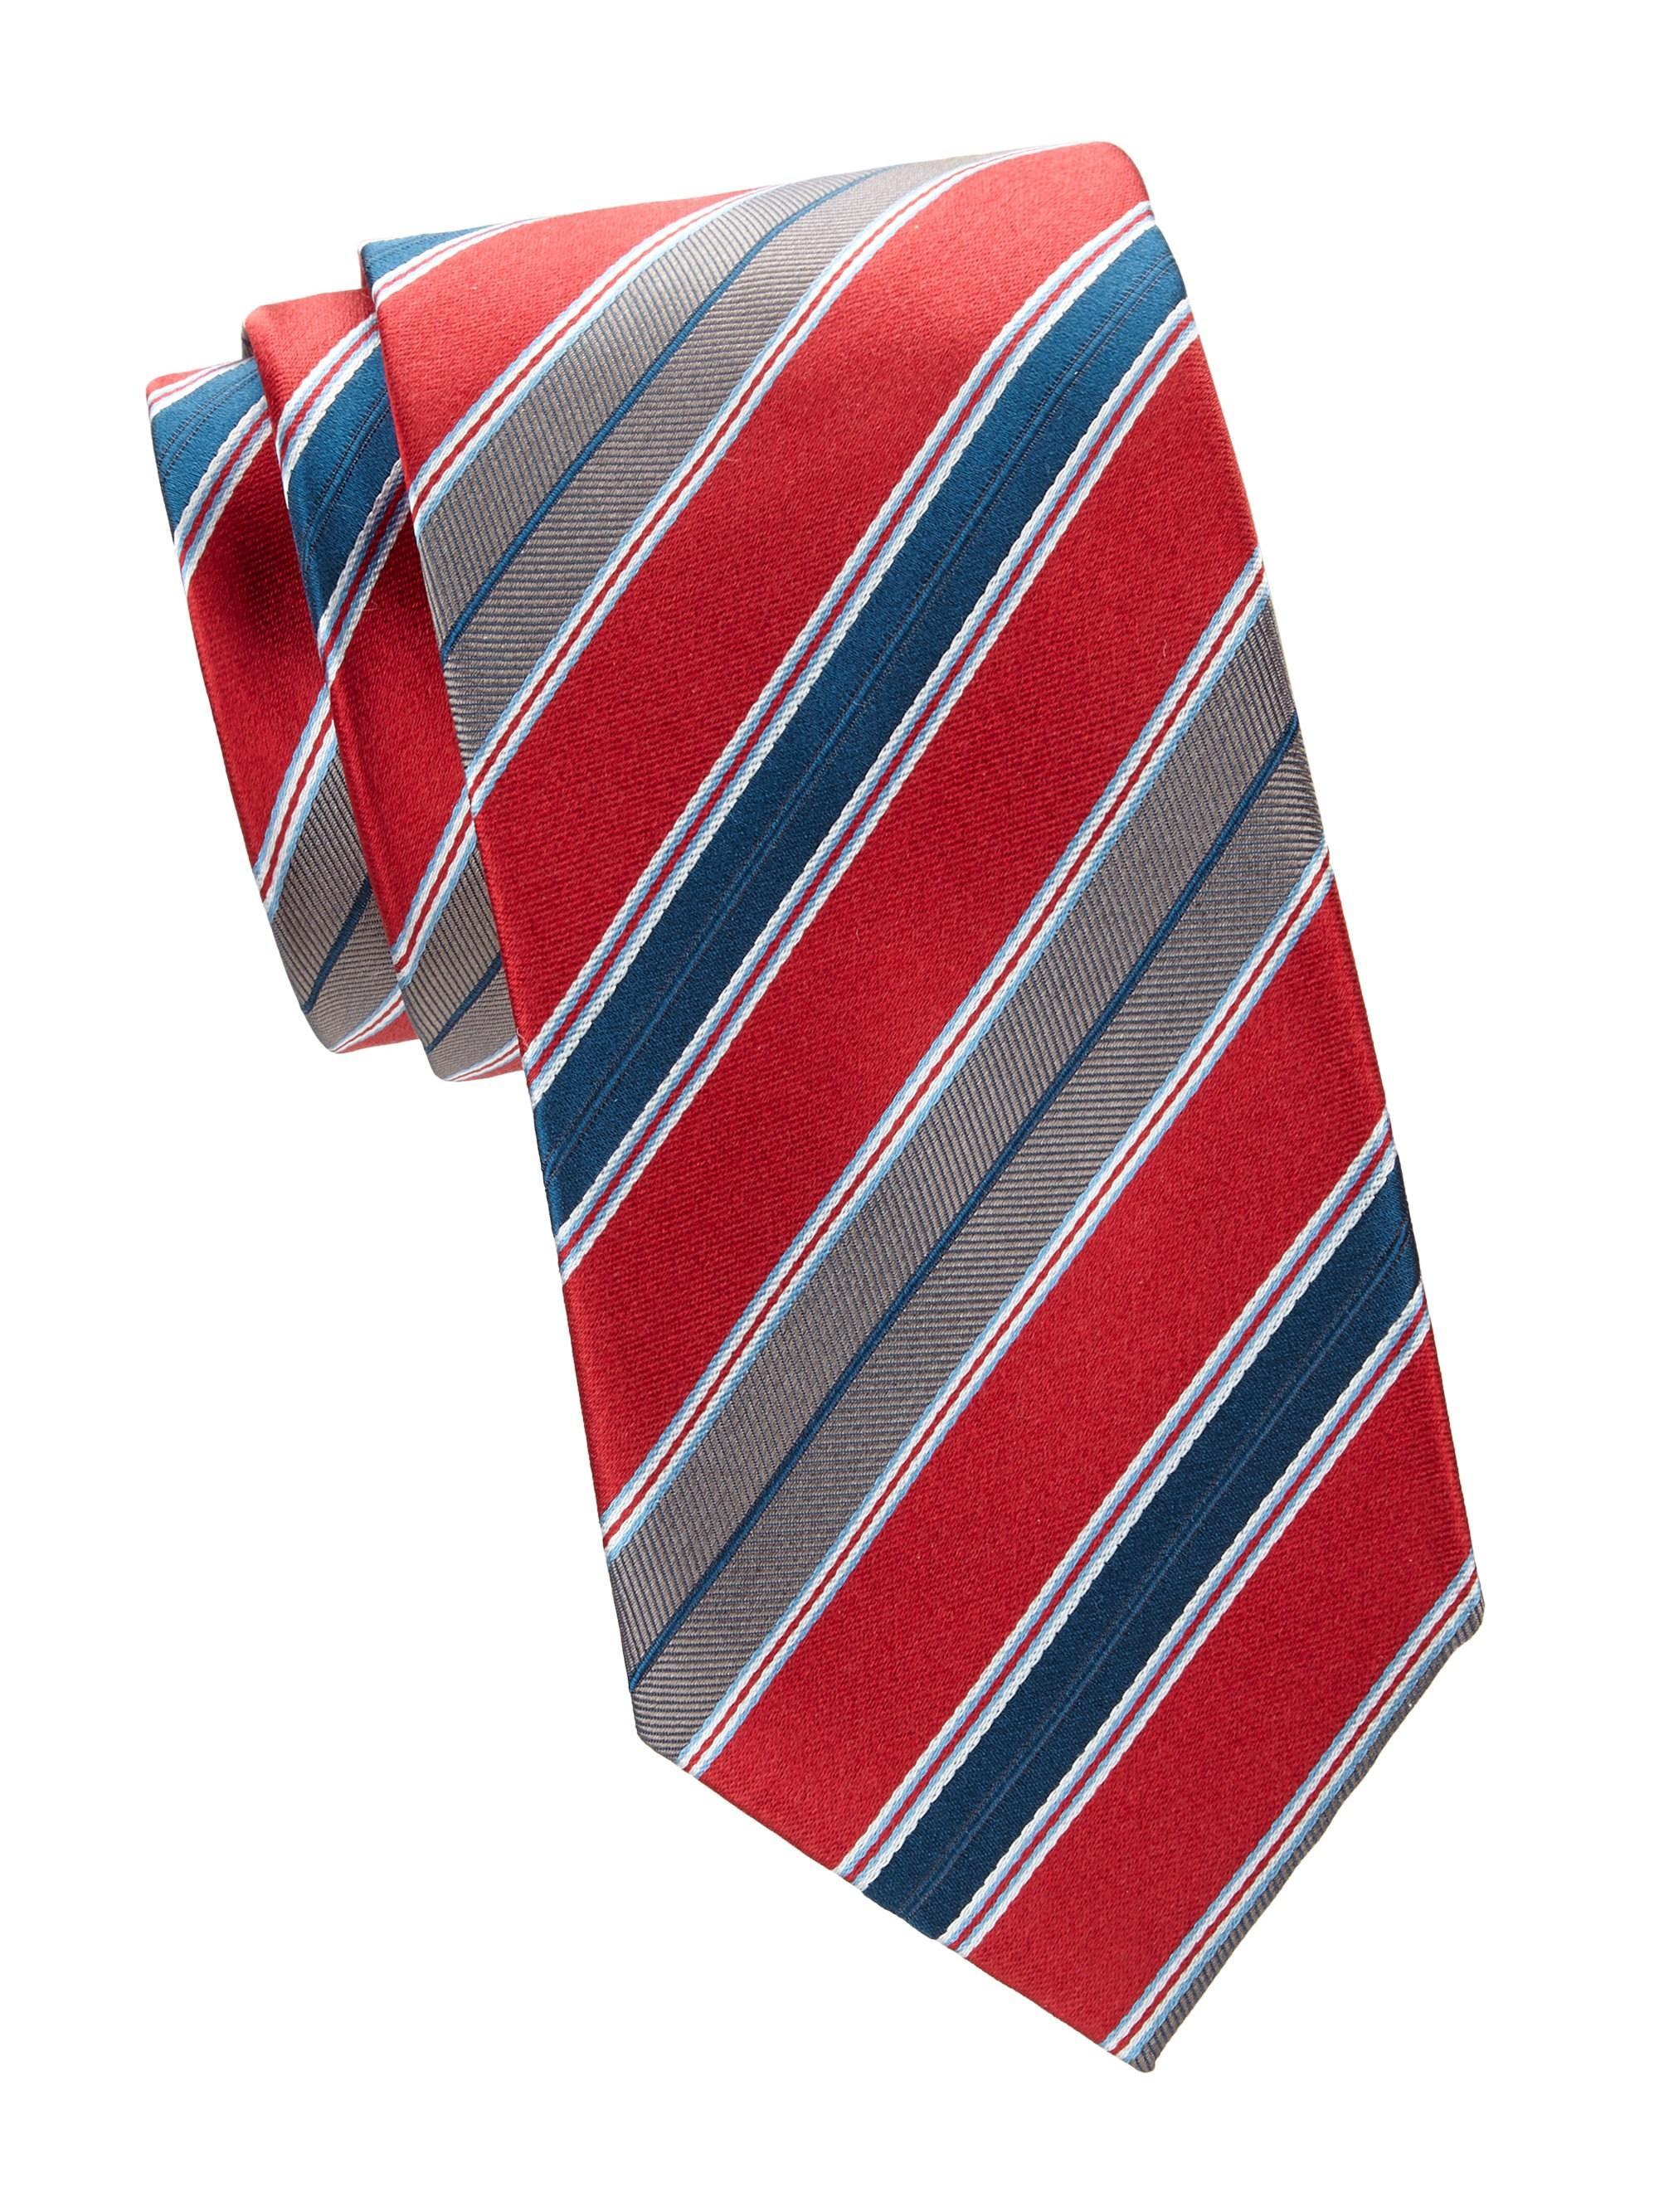 fe1920759367a Brioni Men's Regimental Diagonal Stripe Silk Tie - Purple Dark in ...